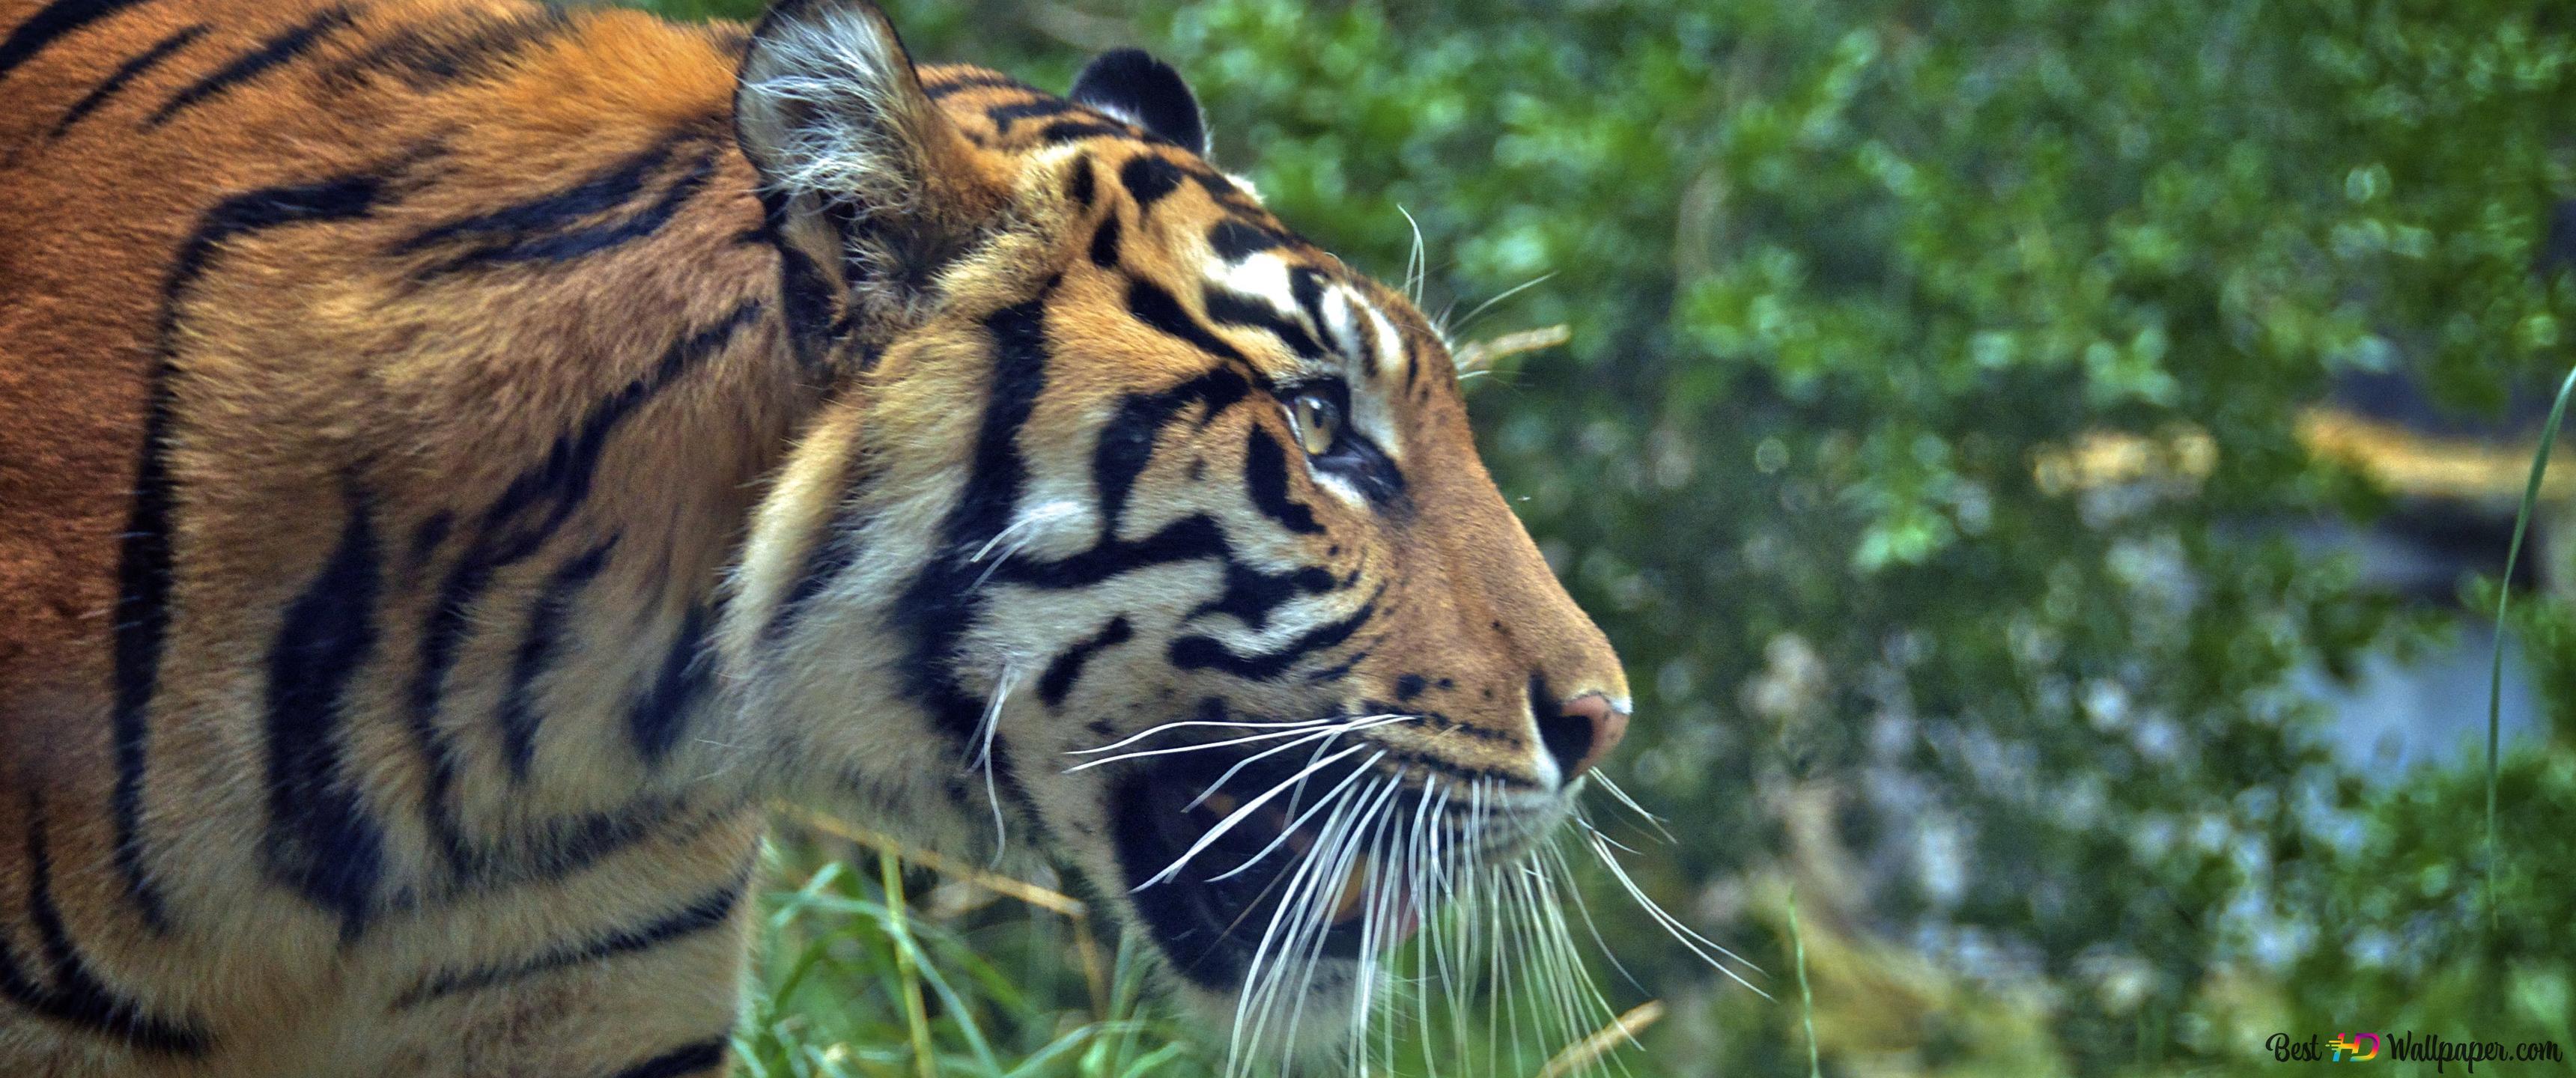 Tiger Attack Mode Hd Tapet Download